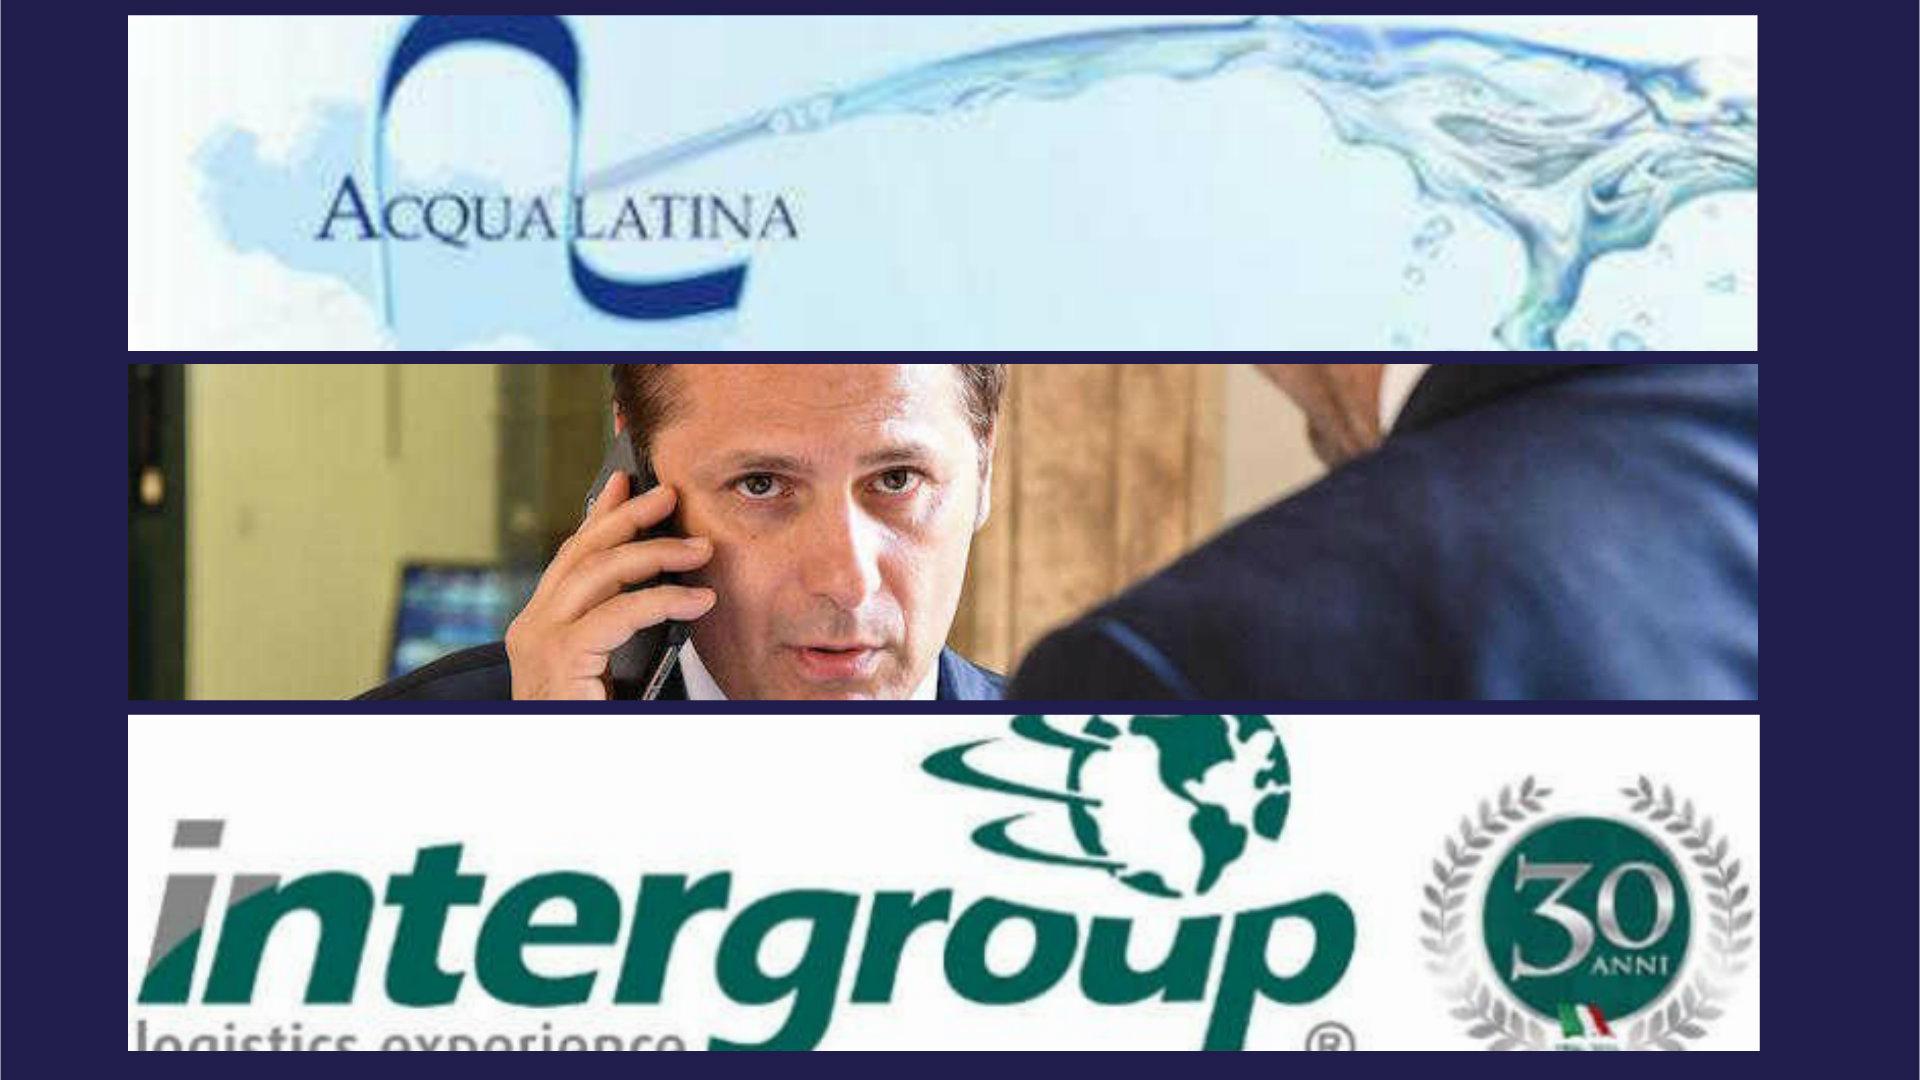 Acqualatina Intergroup